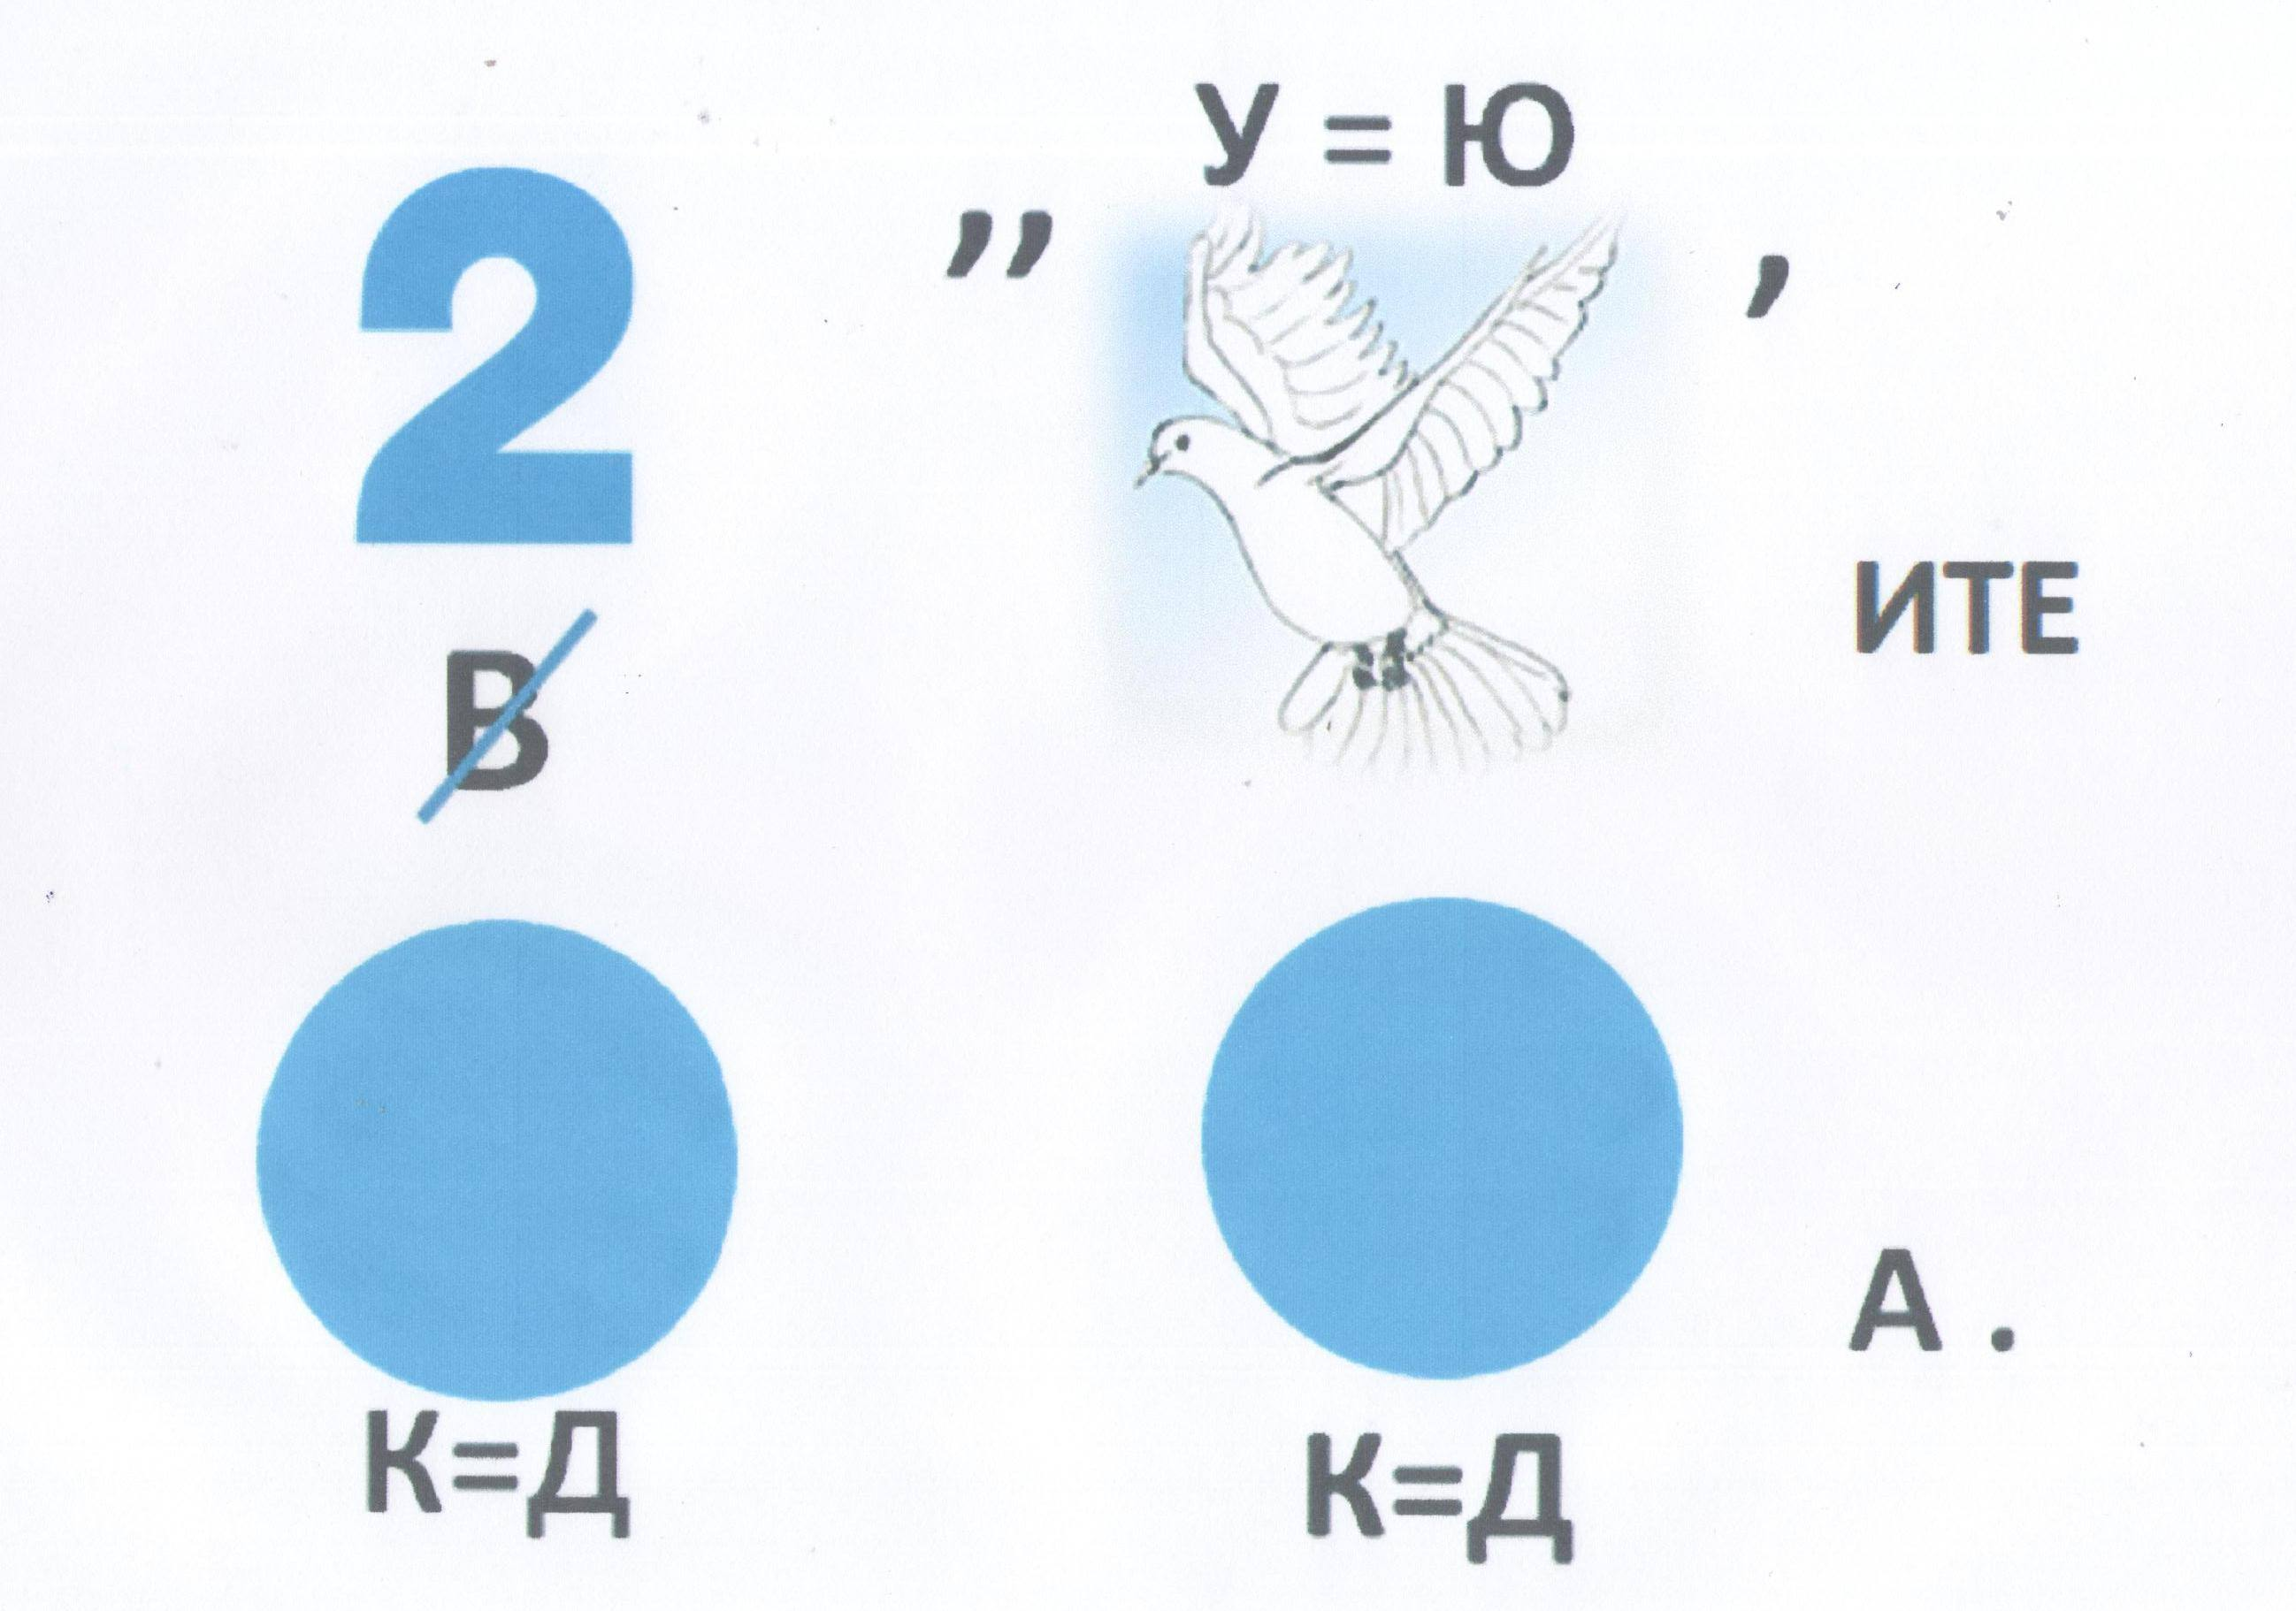 Пустова Ю., Сиваш Д., Кузькин А., ребус 1